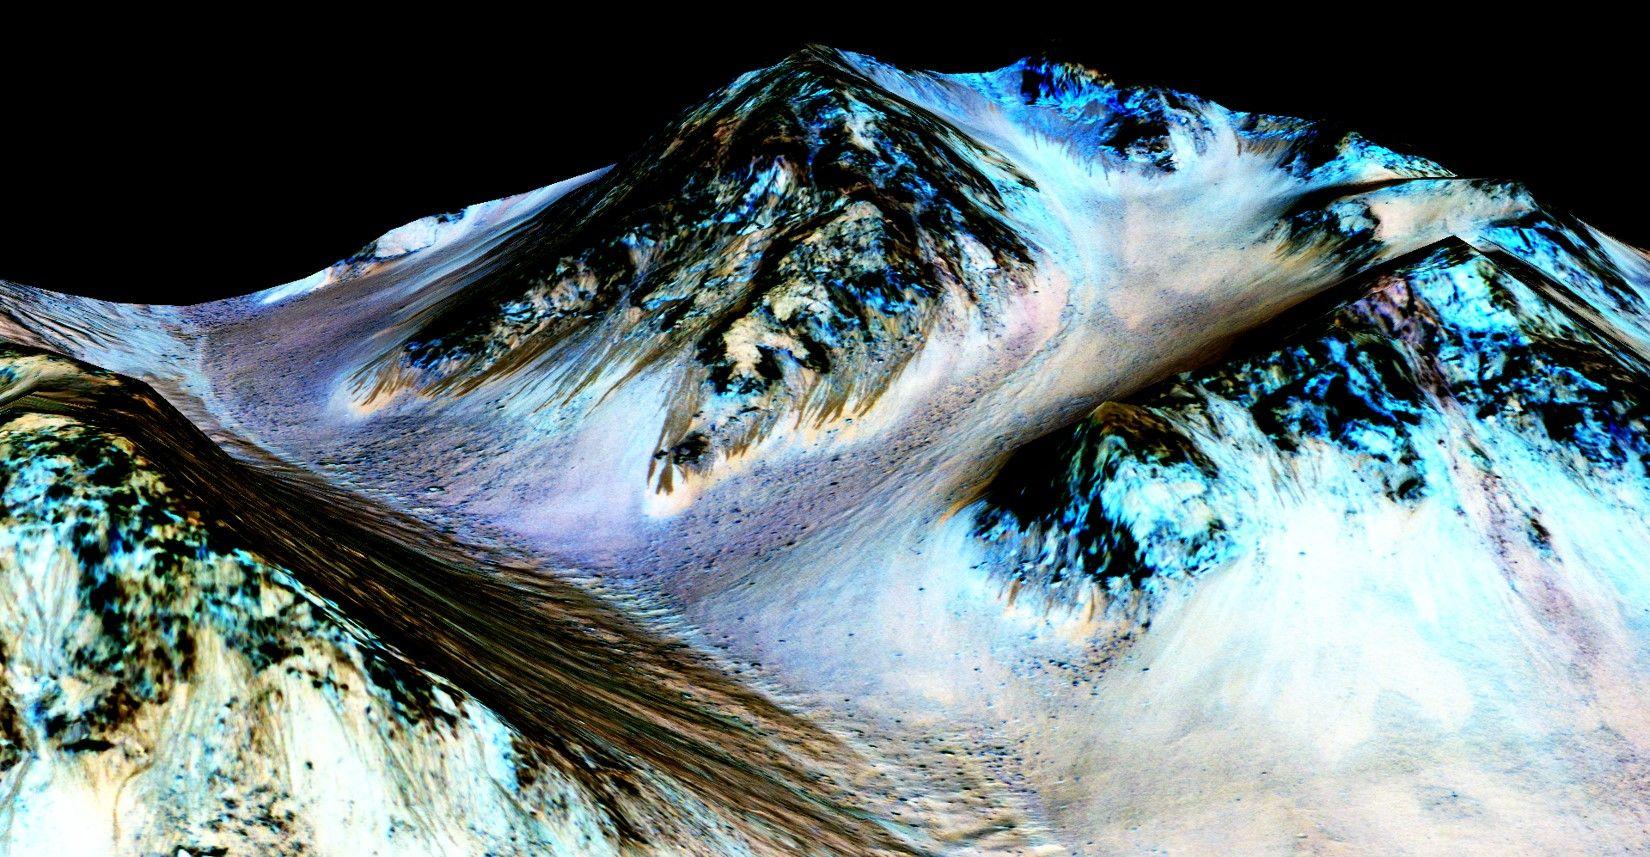 9-28-15 Mars RSL